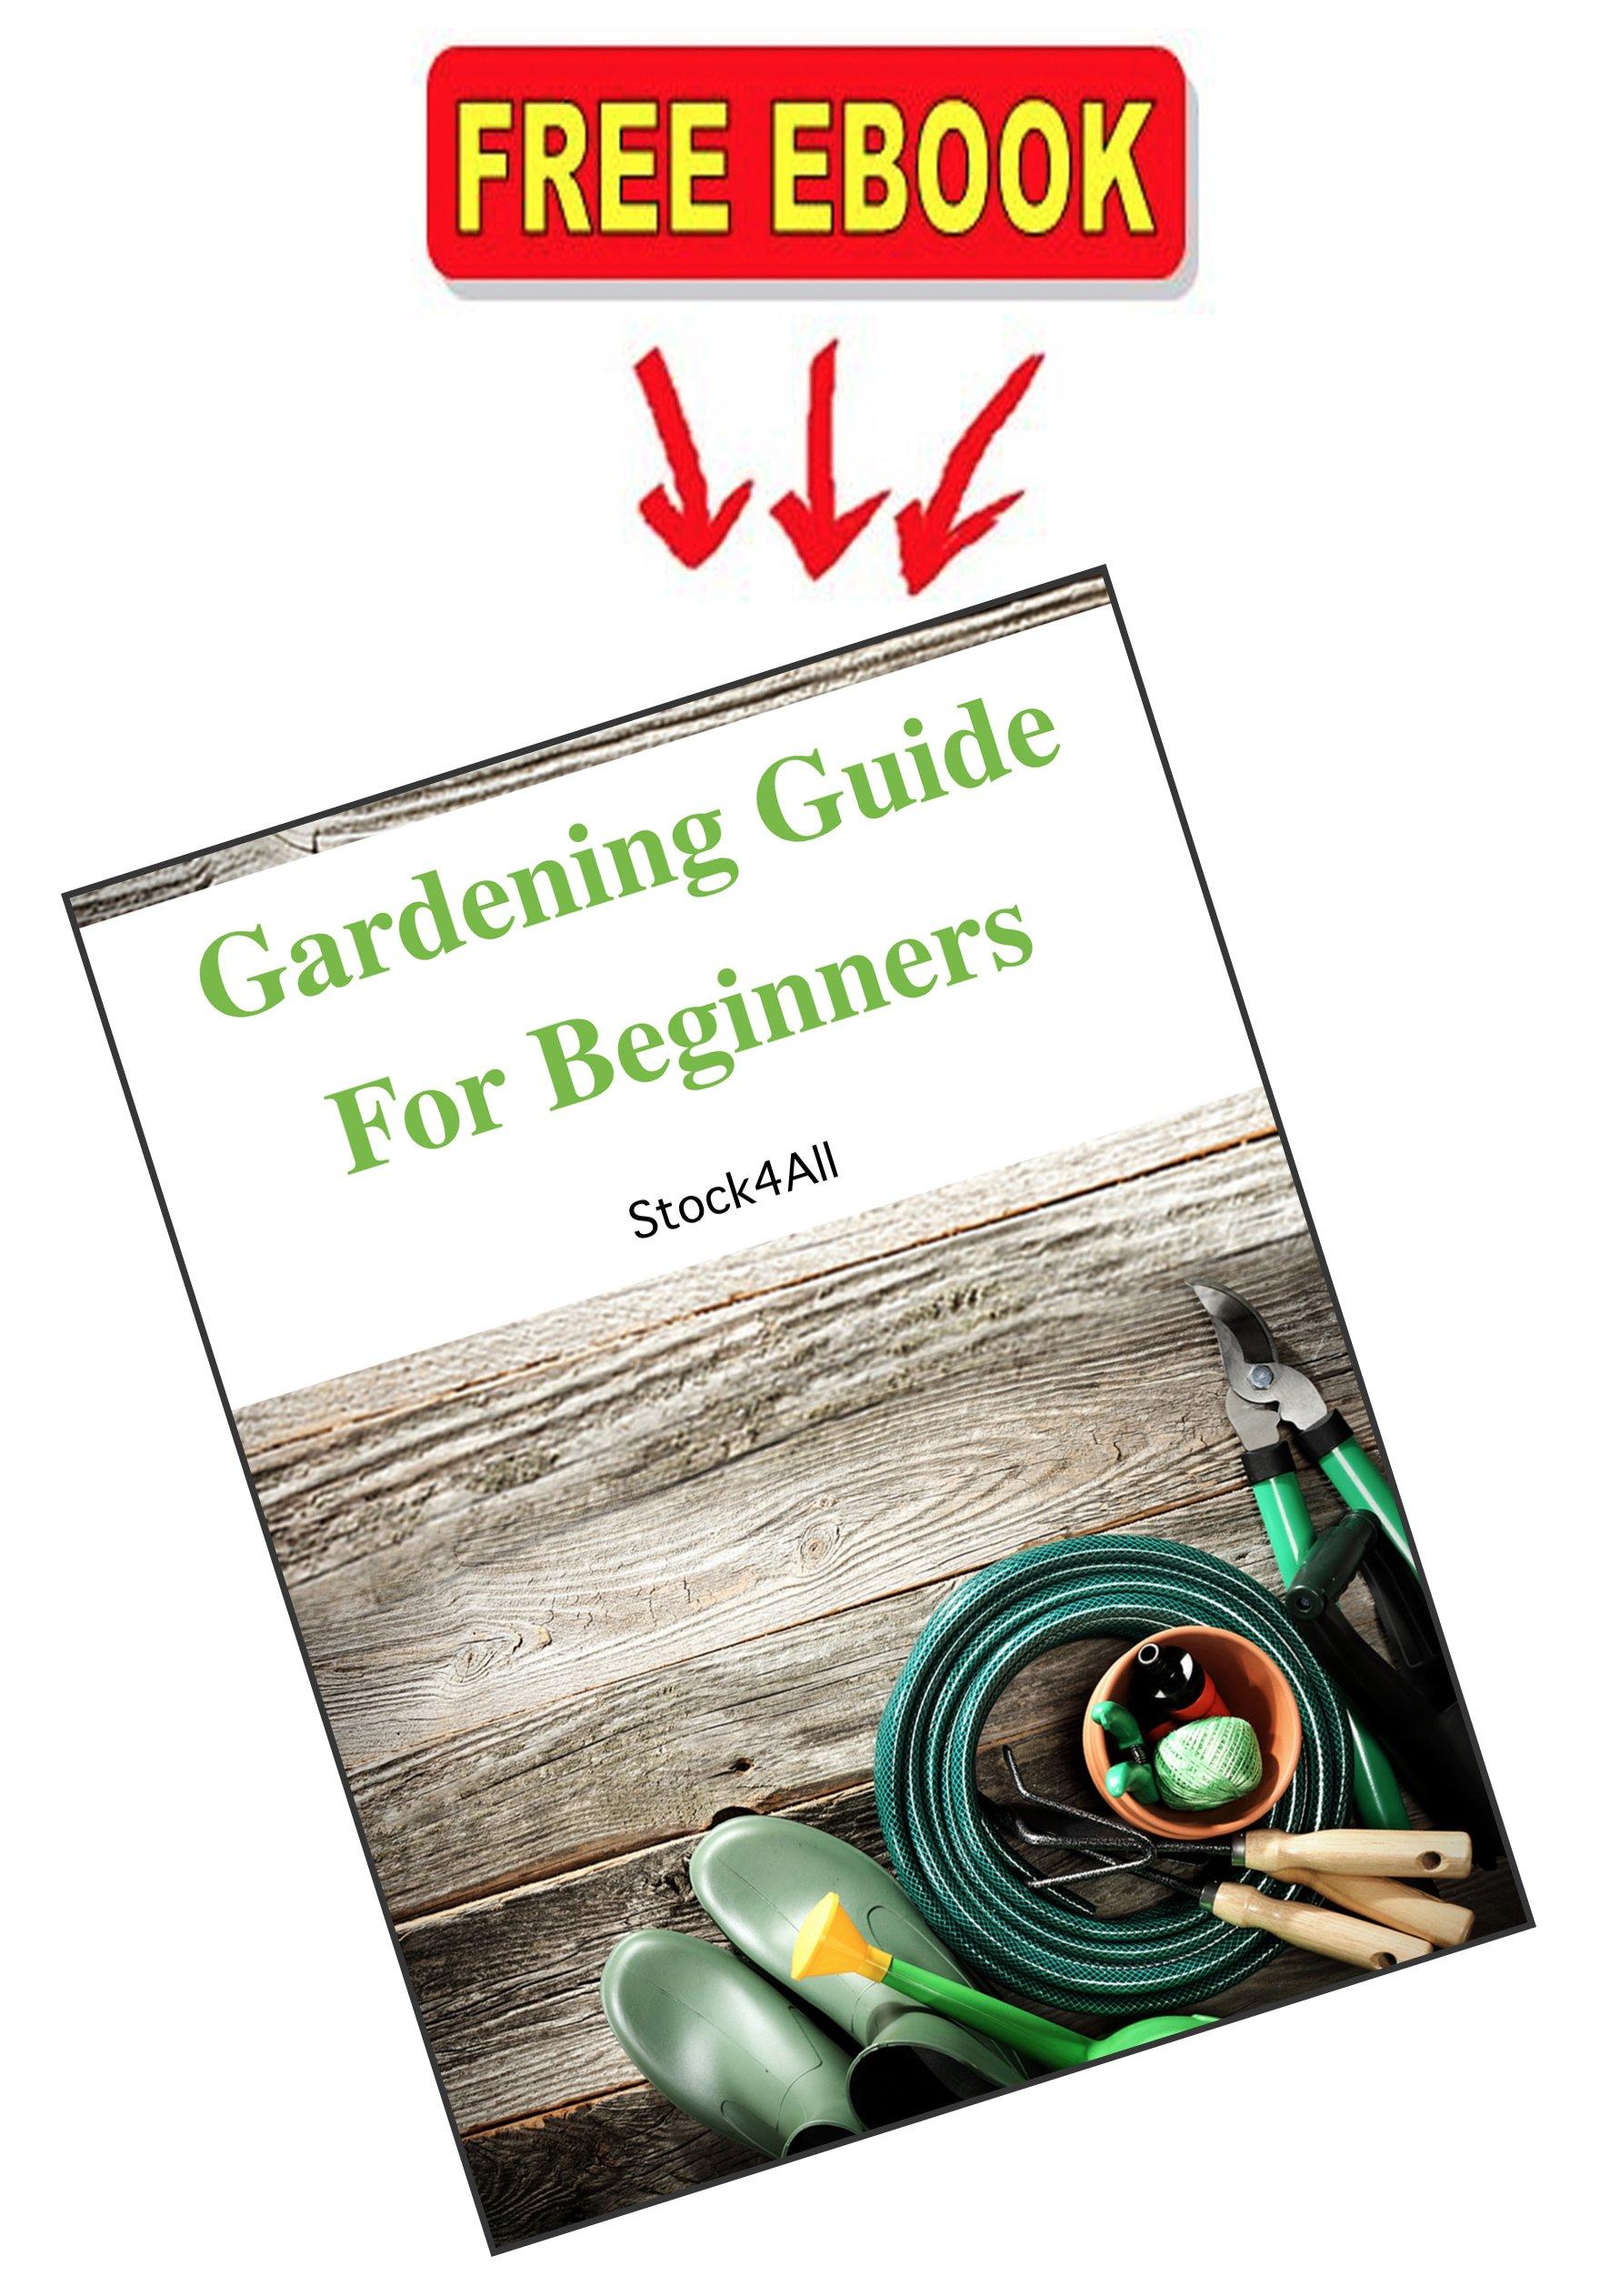 Garden Trowel Multipurpose Tool 14'' Long Premium Super Strong Stainless Steel Metal Gardening Tool & Free Ebook by Stock4All